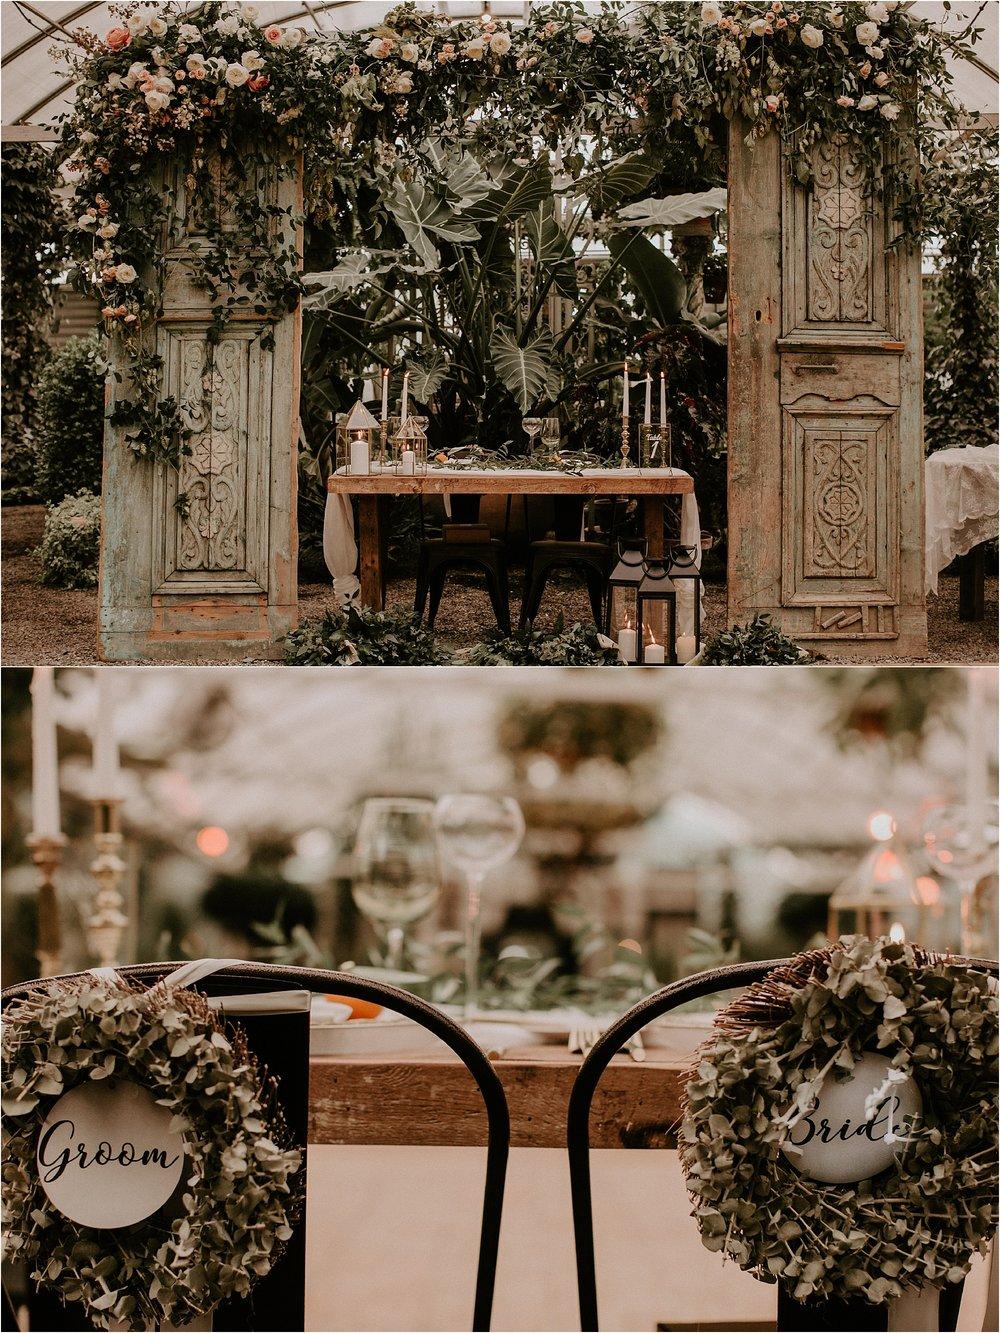 Sarah_Brookhart_Hortulus_Farm_Garden_and_Nursey_Wedding_Photographer_0059.jpg